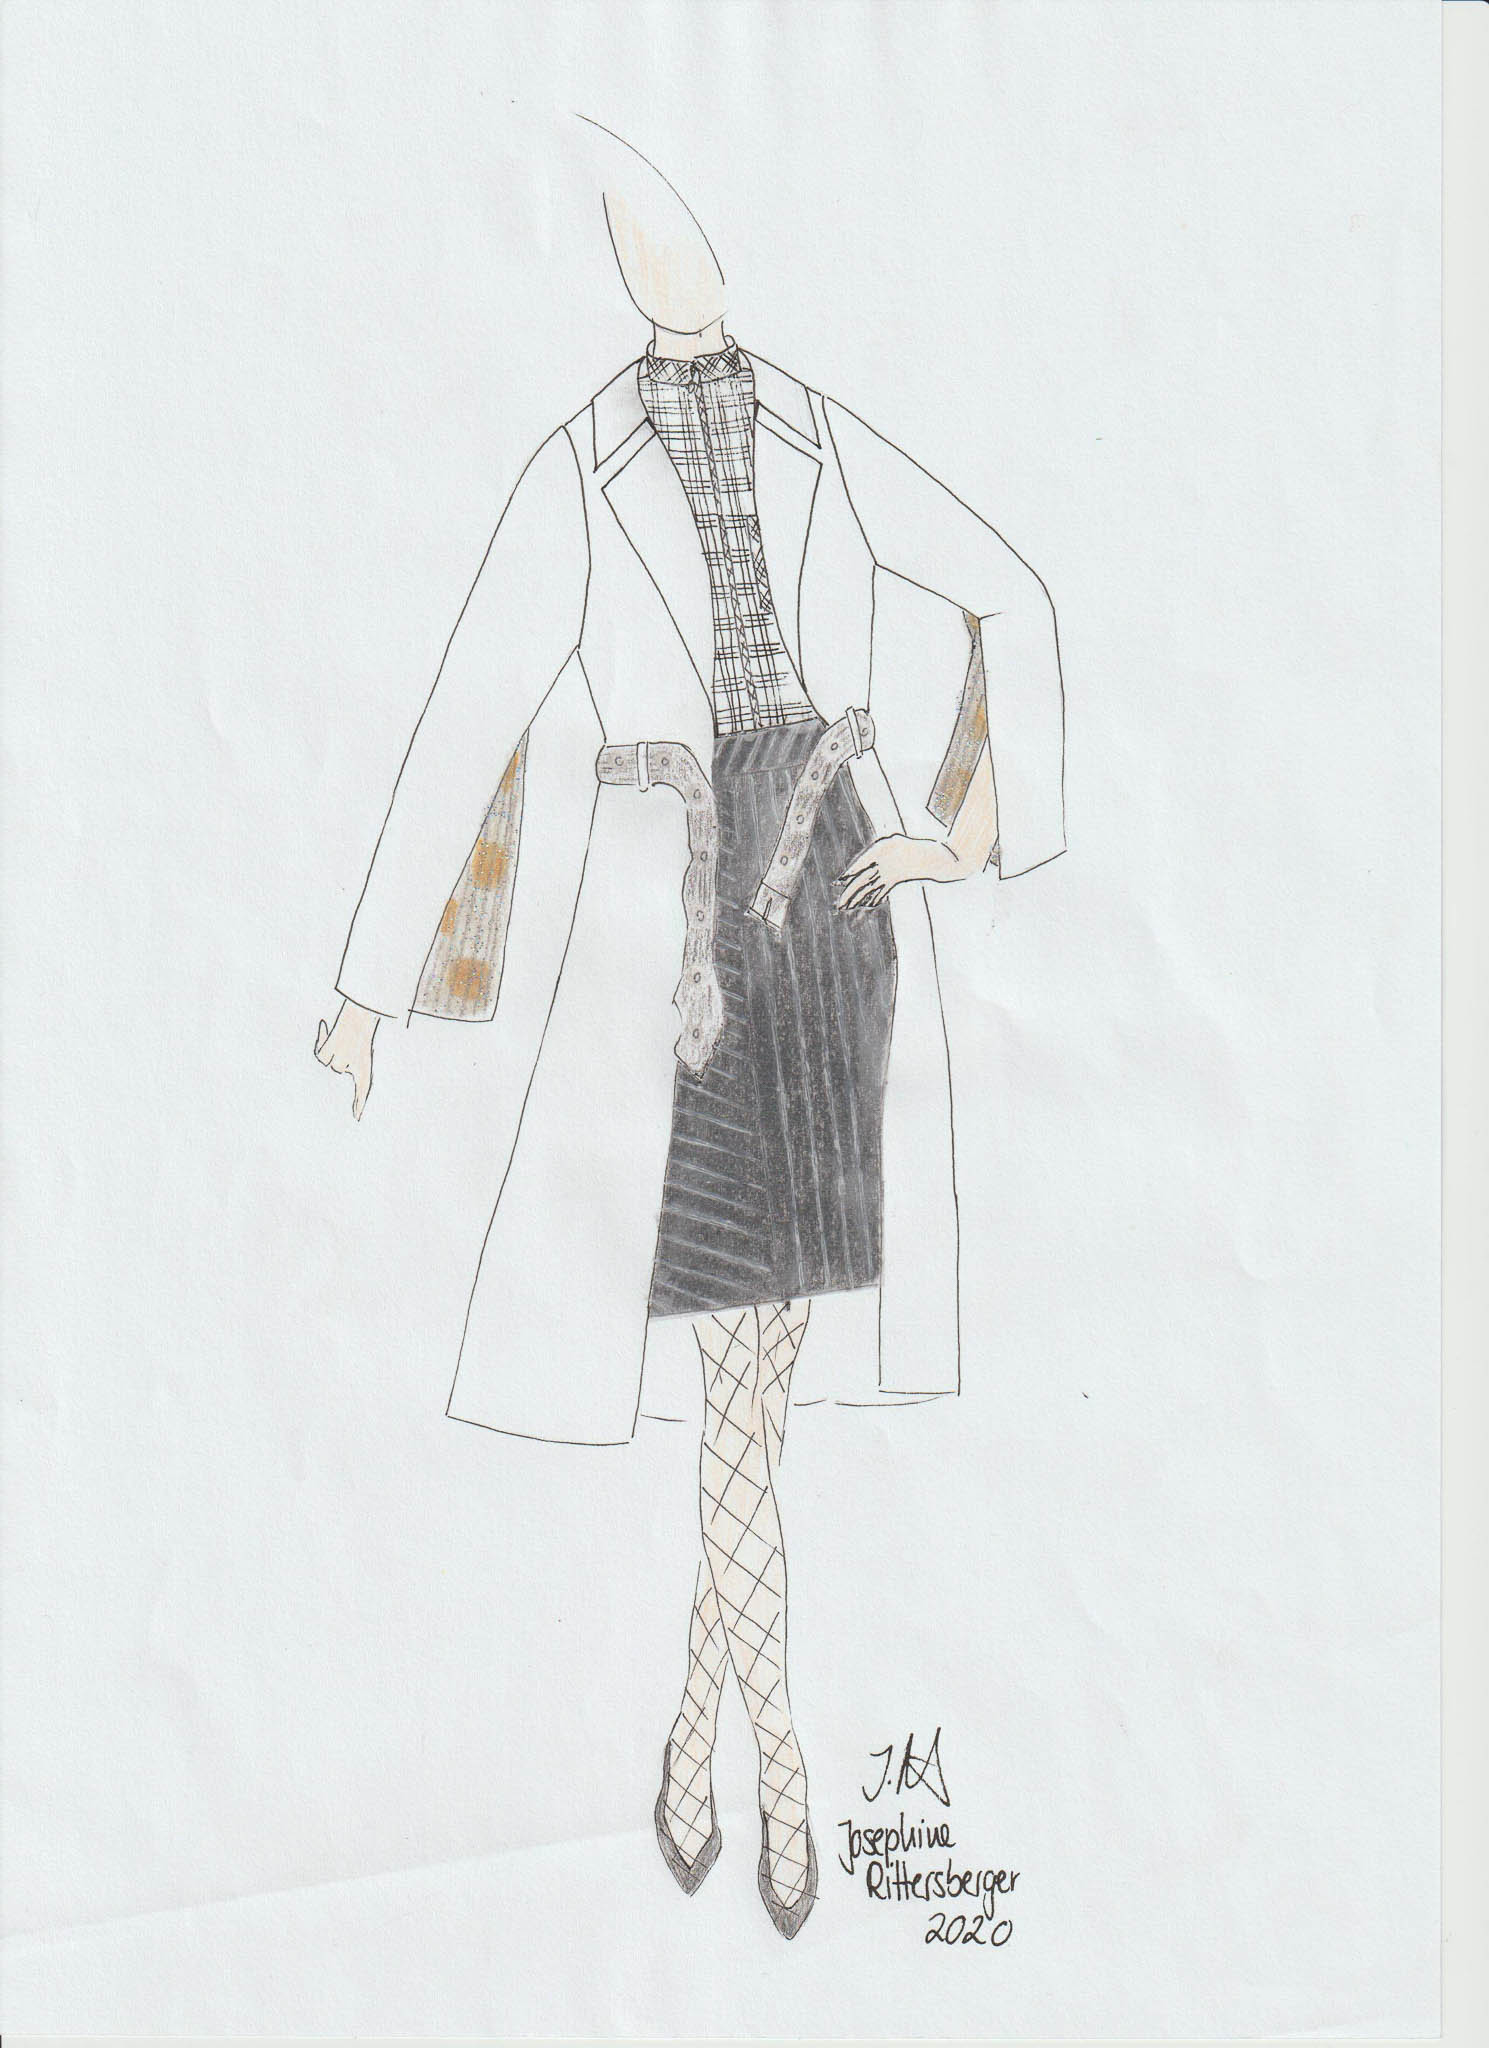 No Title: Josephine Rittersberger, Deutschland, Student, Modeinstitut Gabriel (Cradle to Cradle)